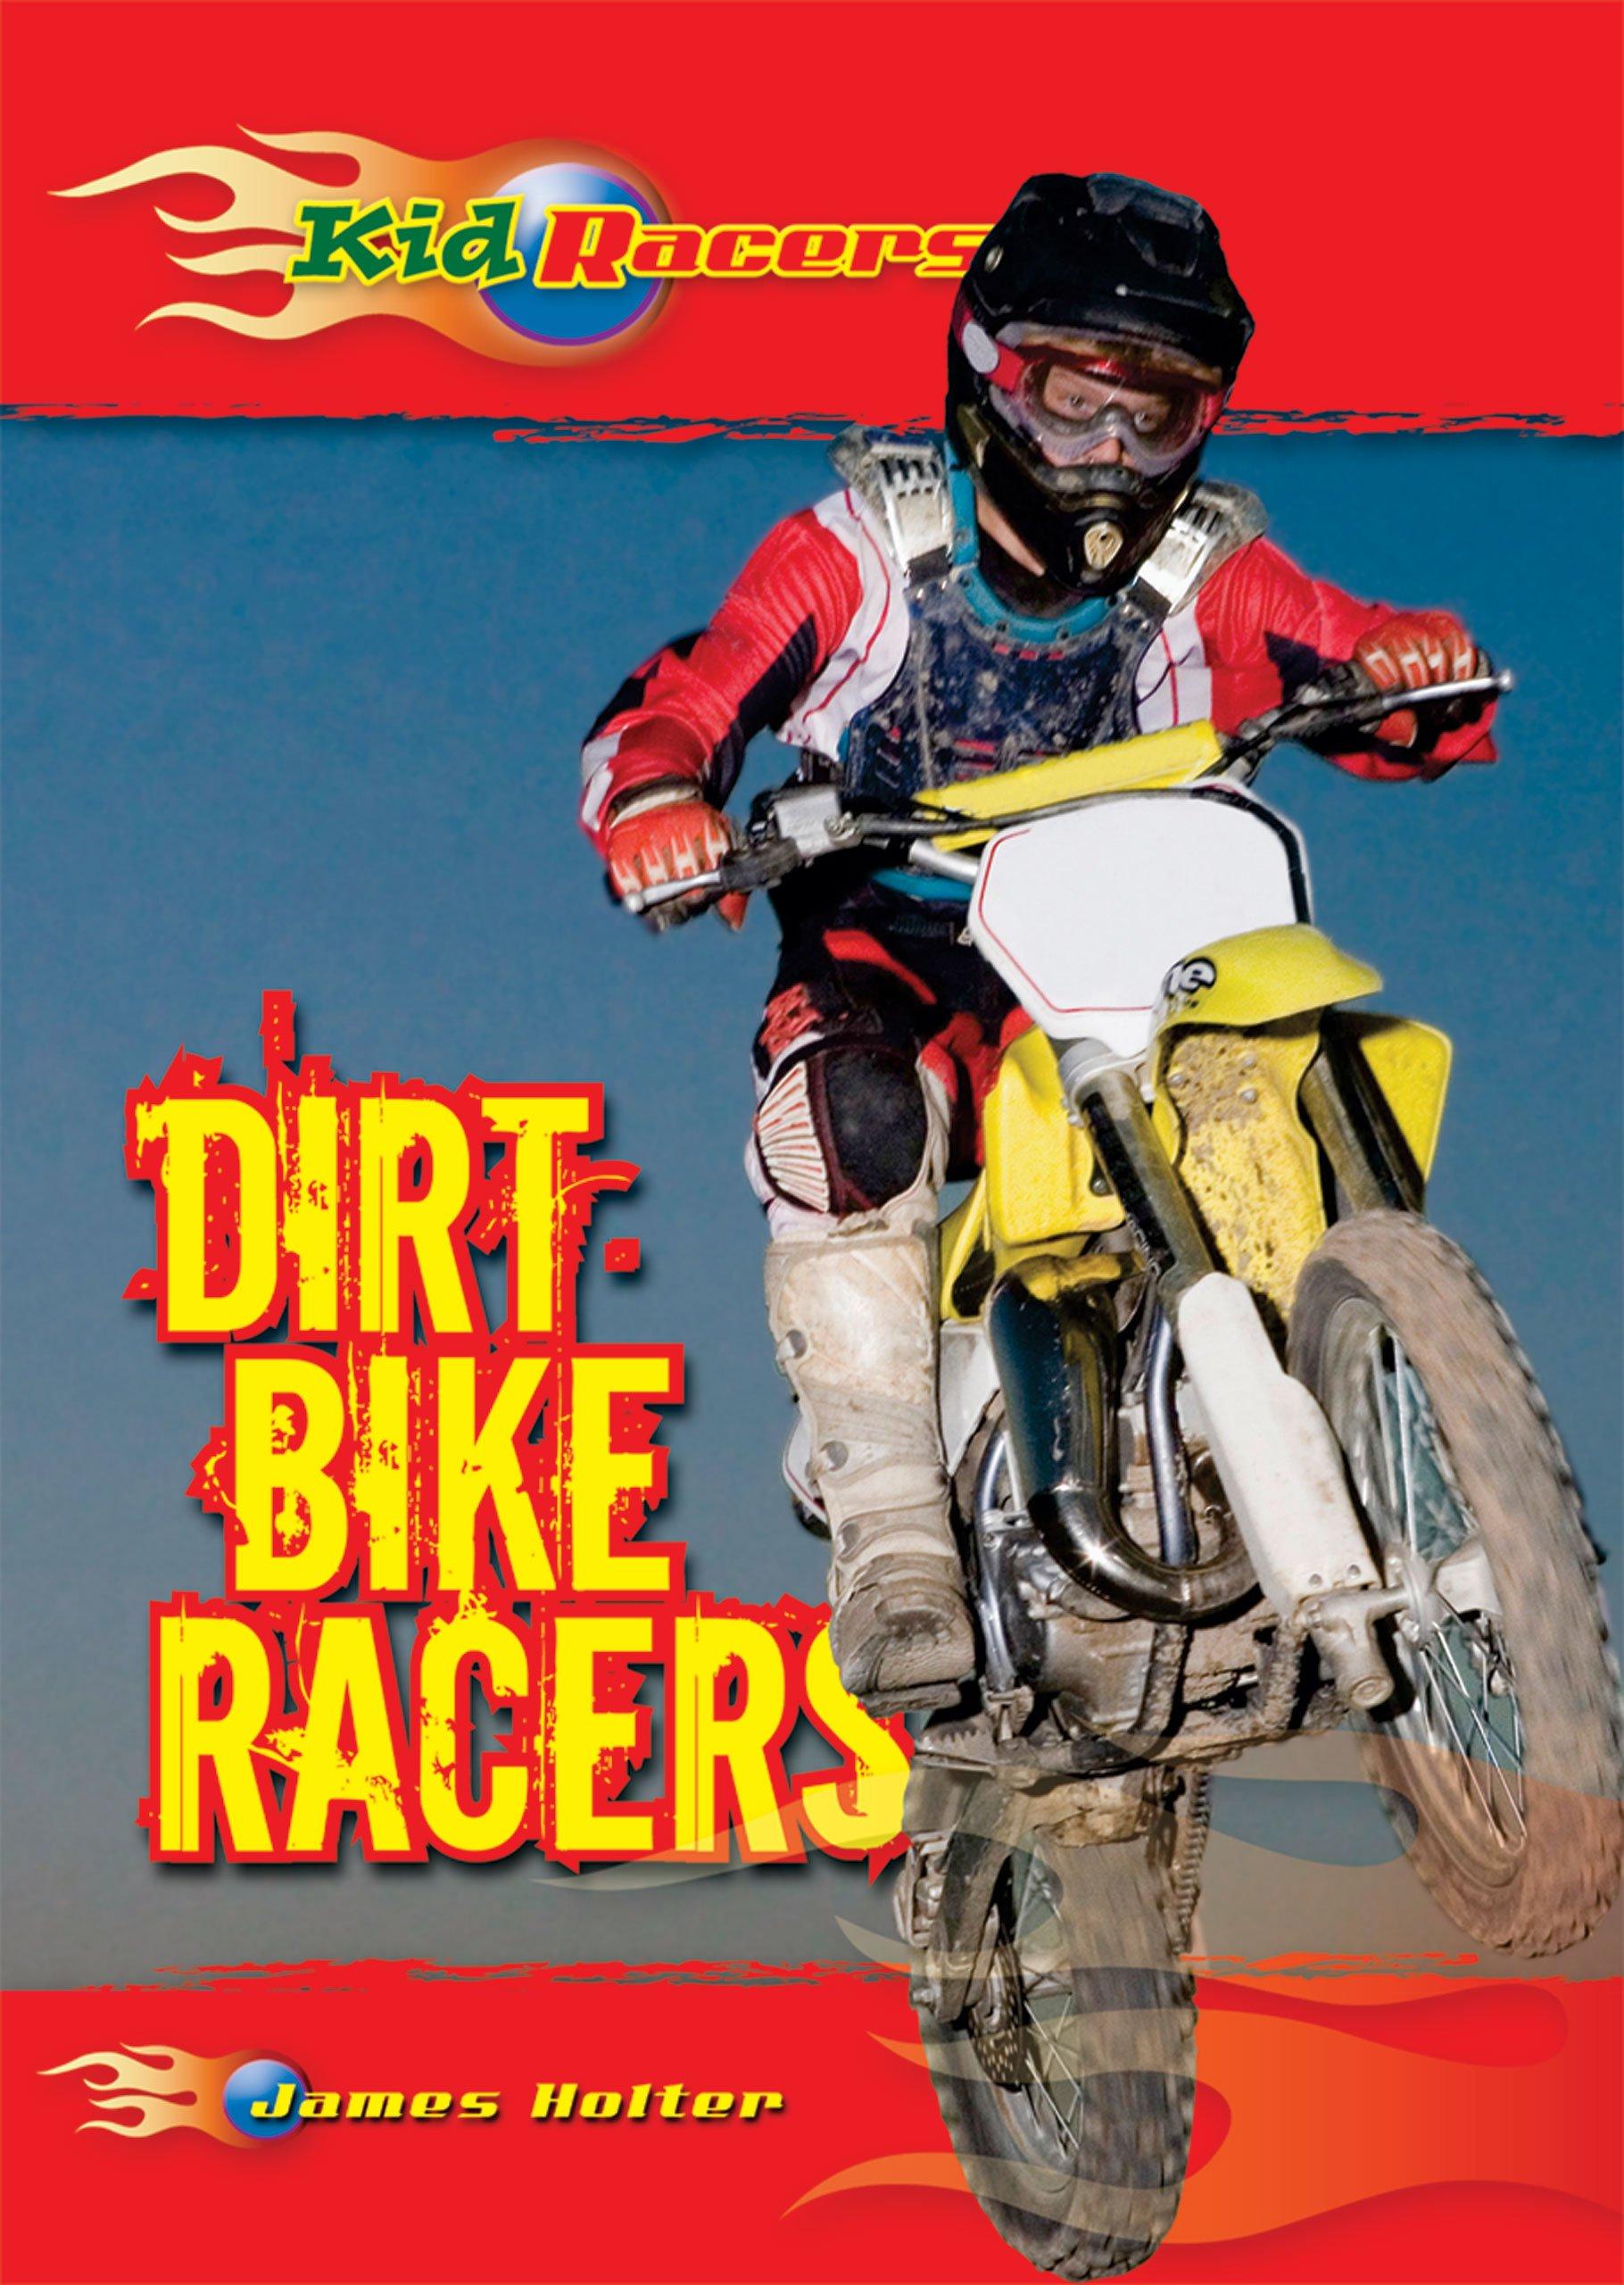 Dirt Bike Racers James Holter 9780766034839 Books